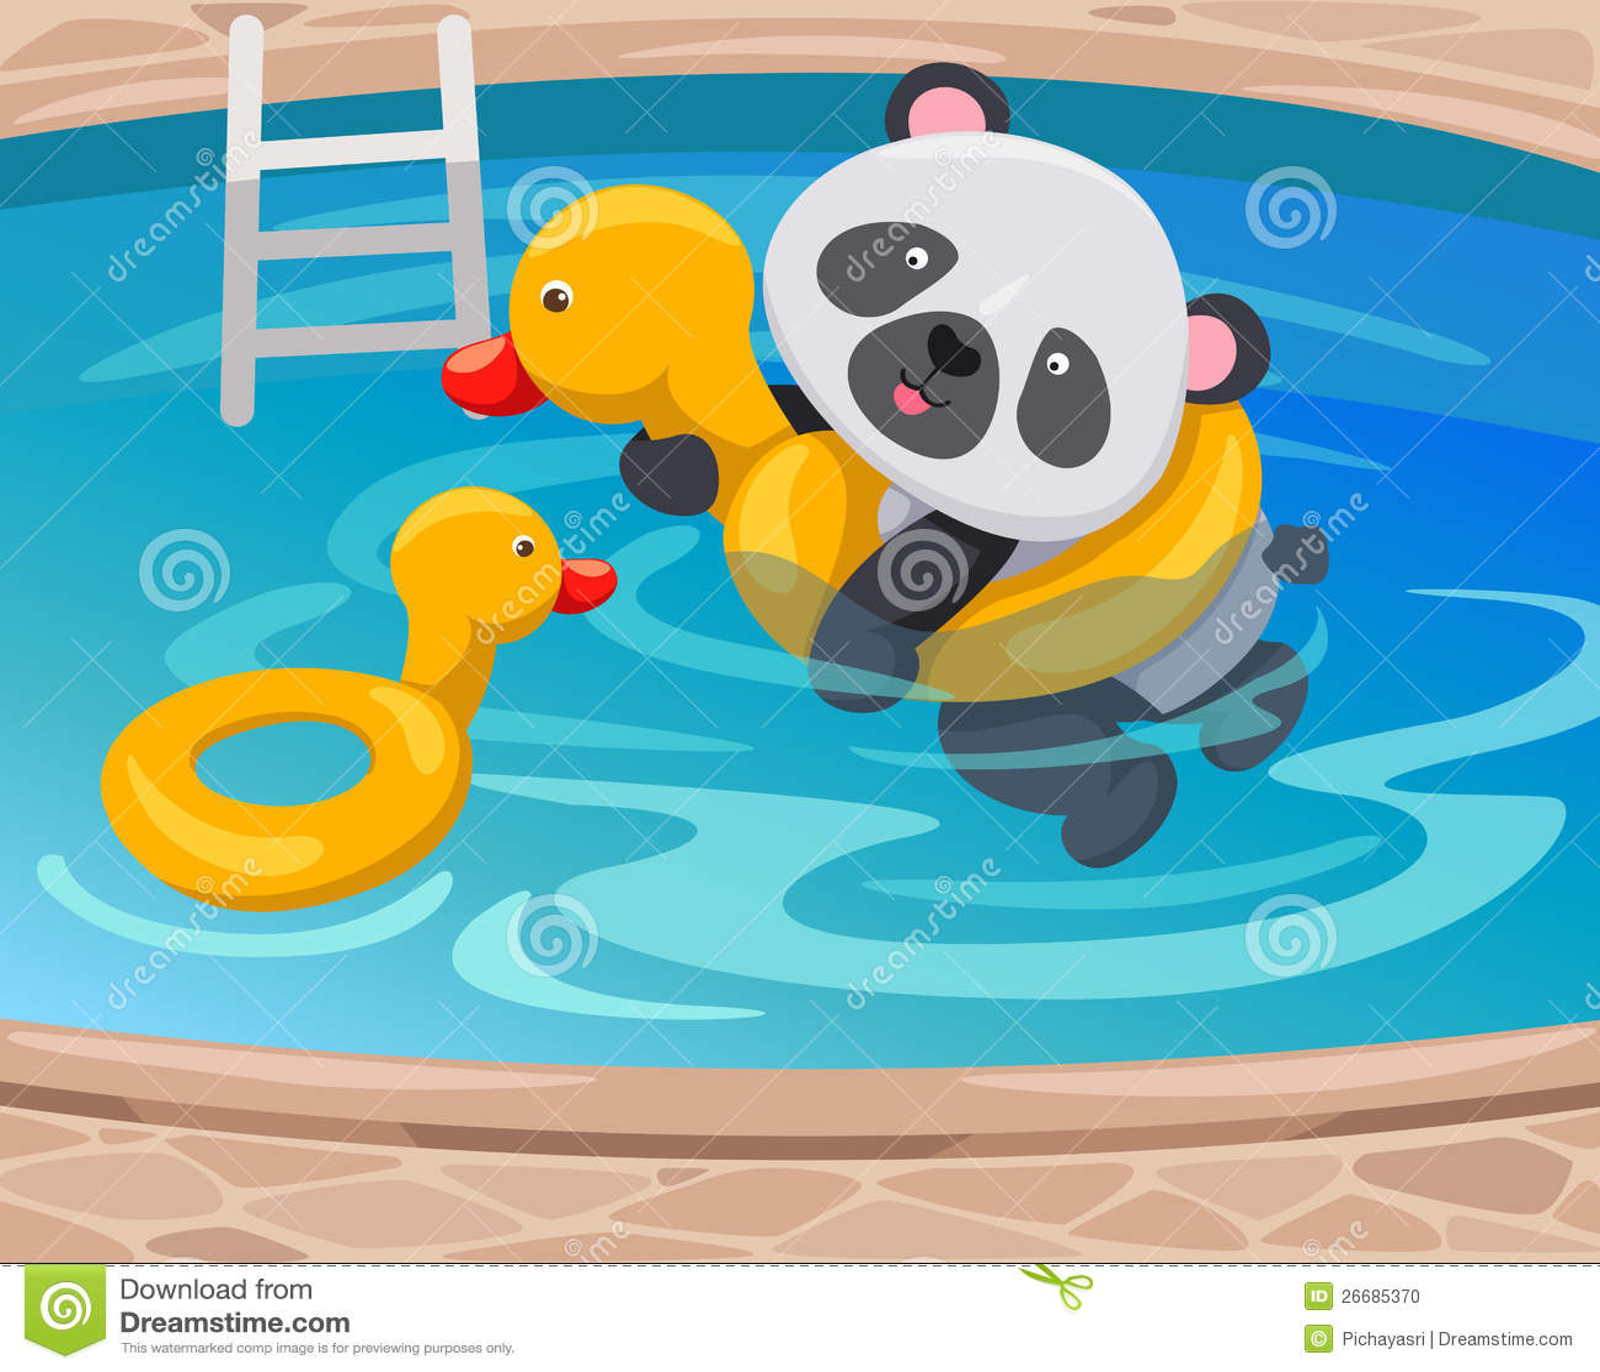 Panda Swimming With Duck Tube Stock Photo Image 26685370